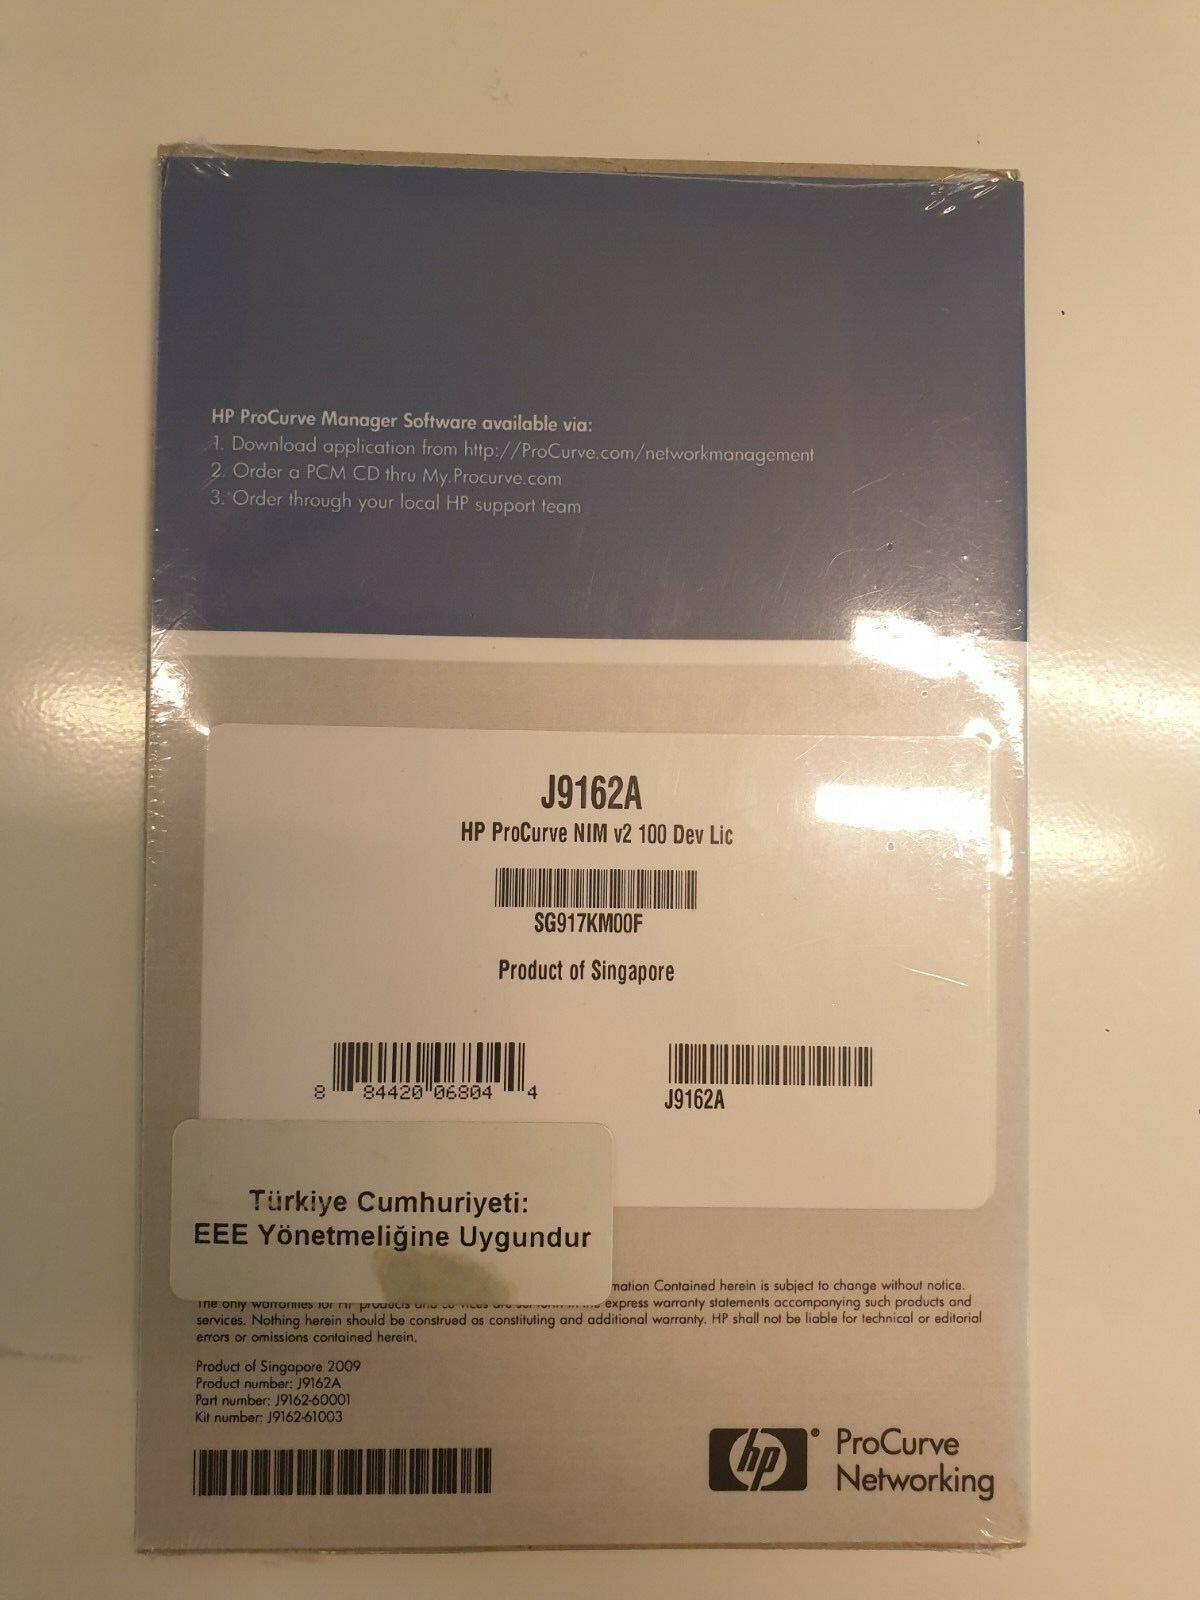 HP ProCurve Network Immunity Manager (NIM) v2 100-Device License J9162A